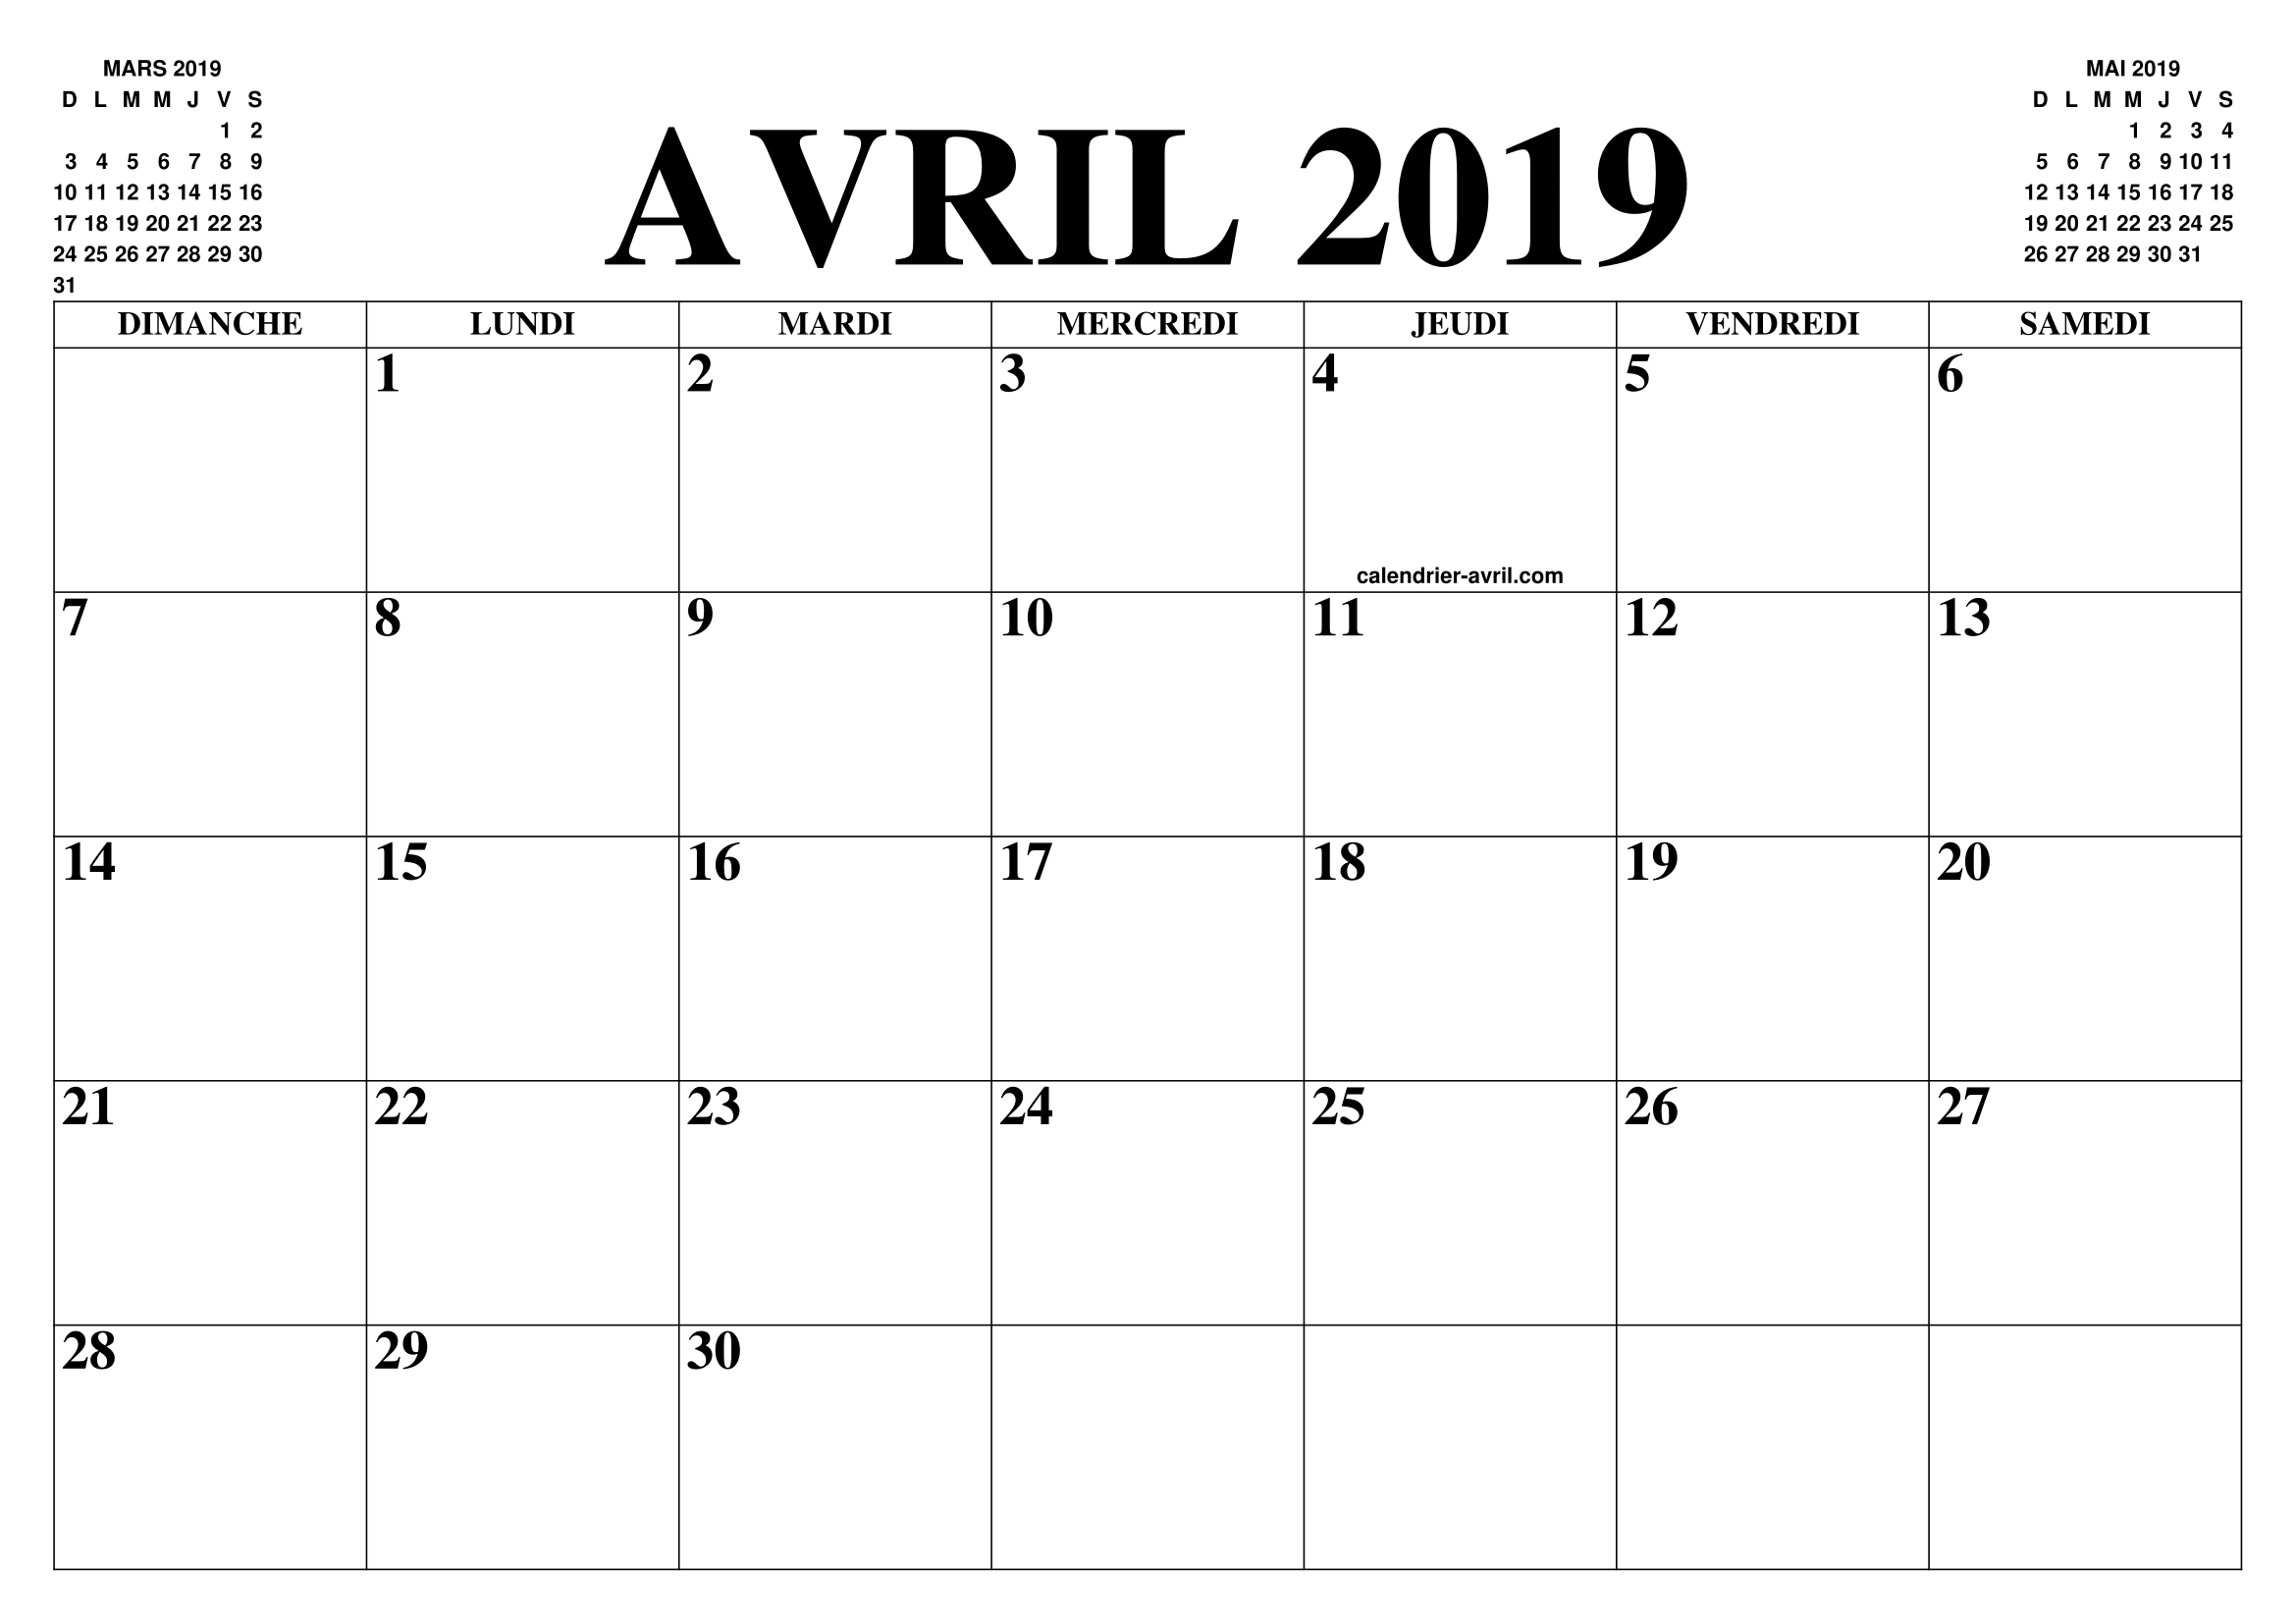 Calendrier Avril Mai Juin 2019.Calendrier Avril 2019 2020 Le Calendrier Du Mois De